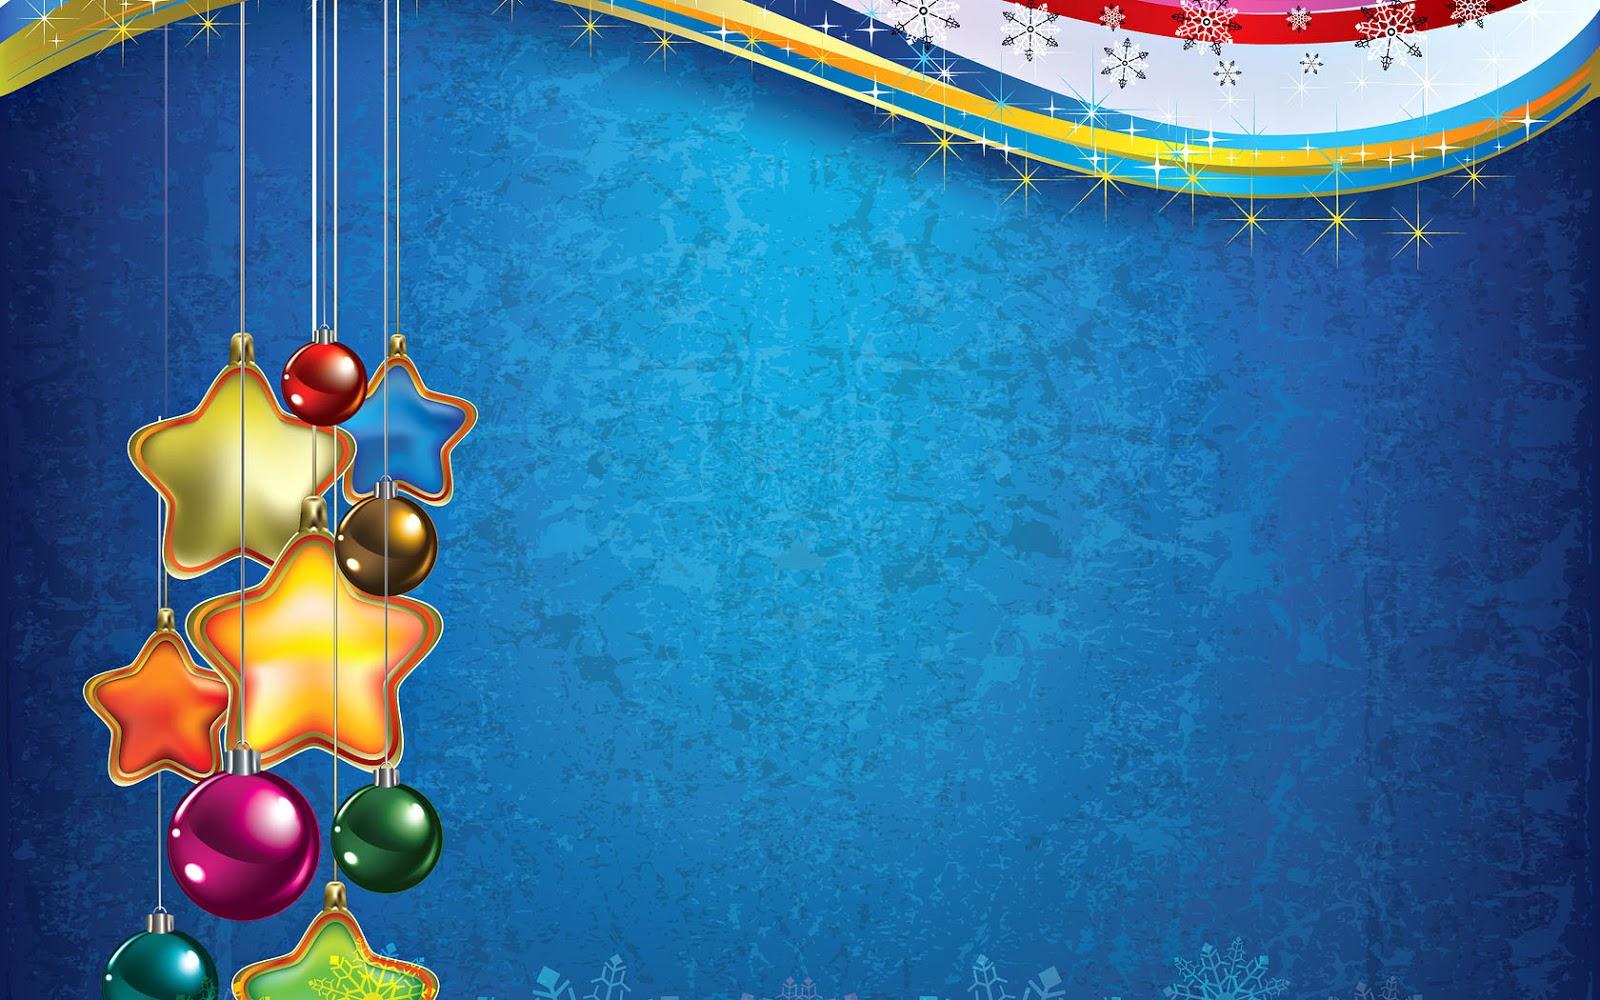 K 3d Wallpaper Mooie 3d Kerst Achtergrond Mooie Leuke Achtergronden